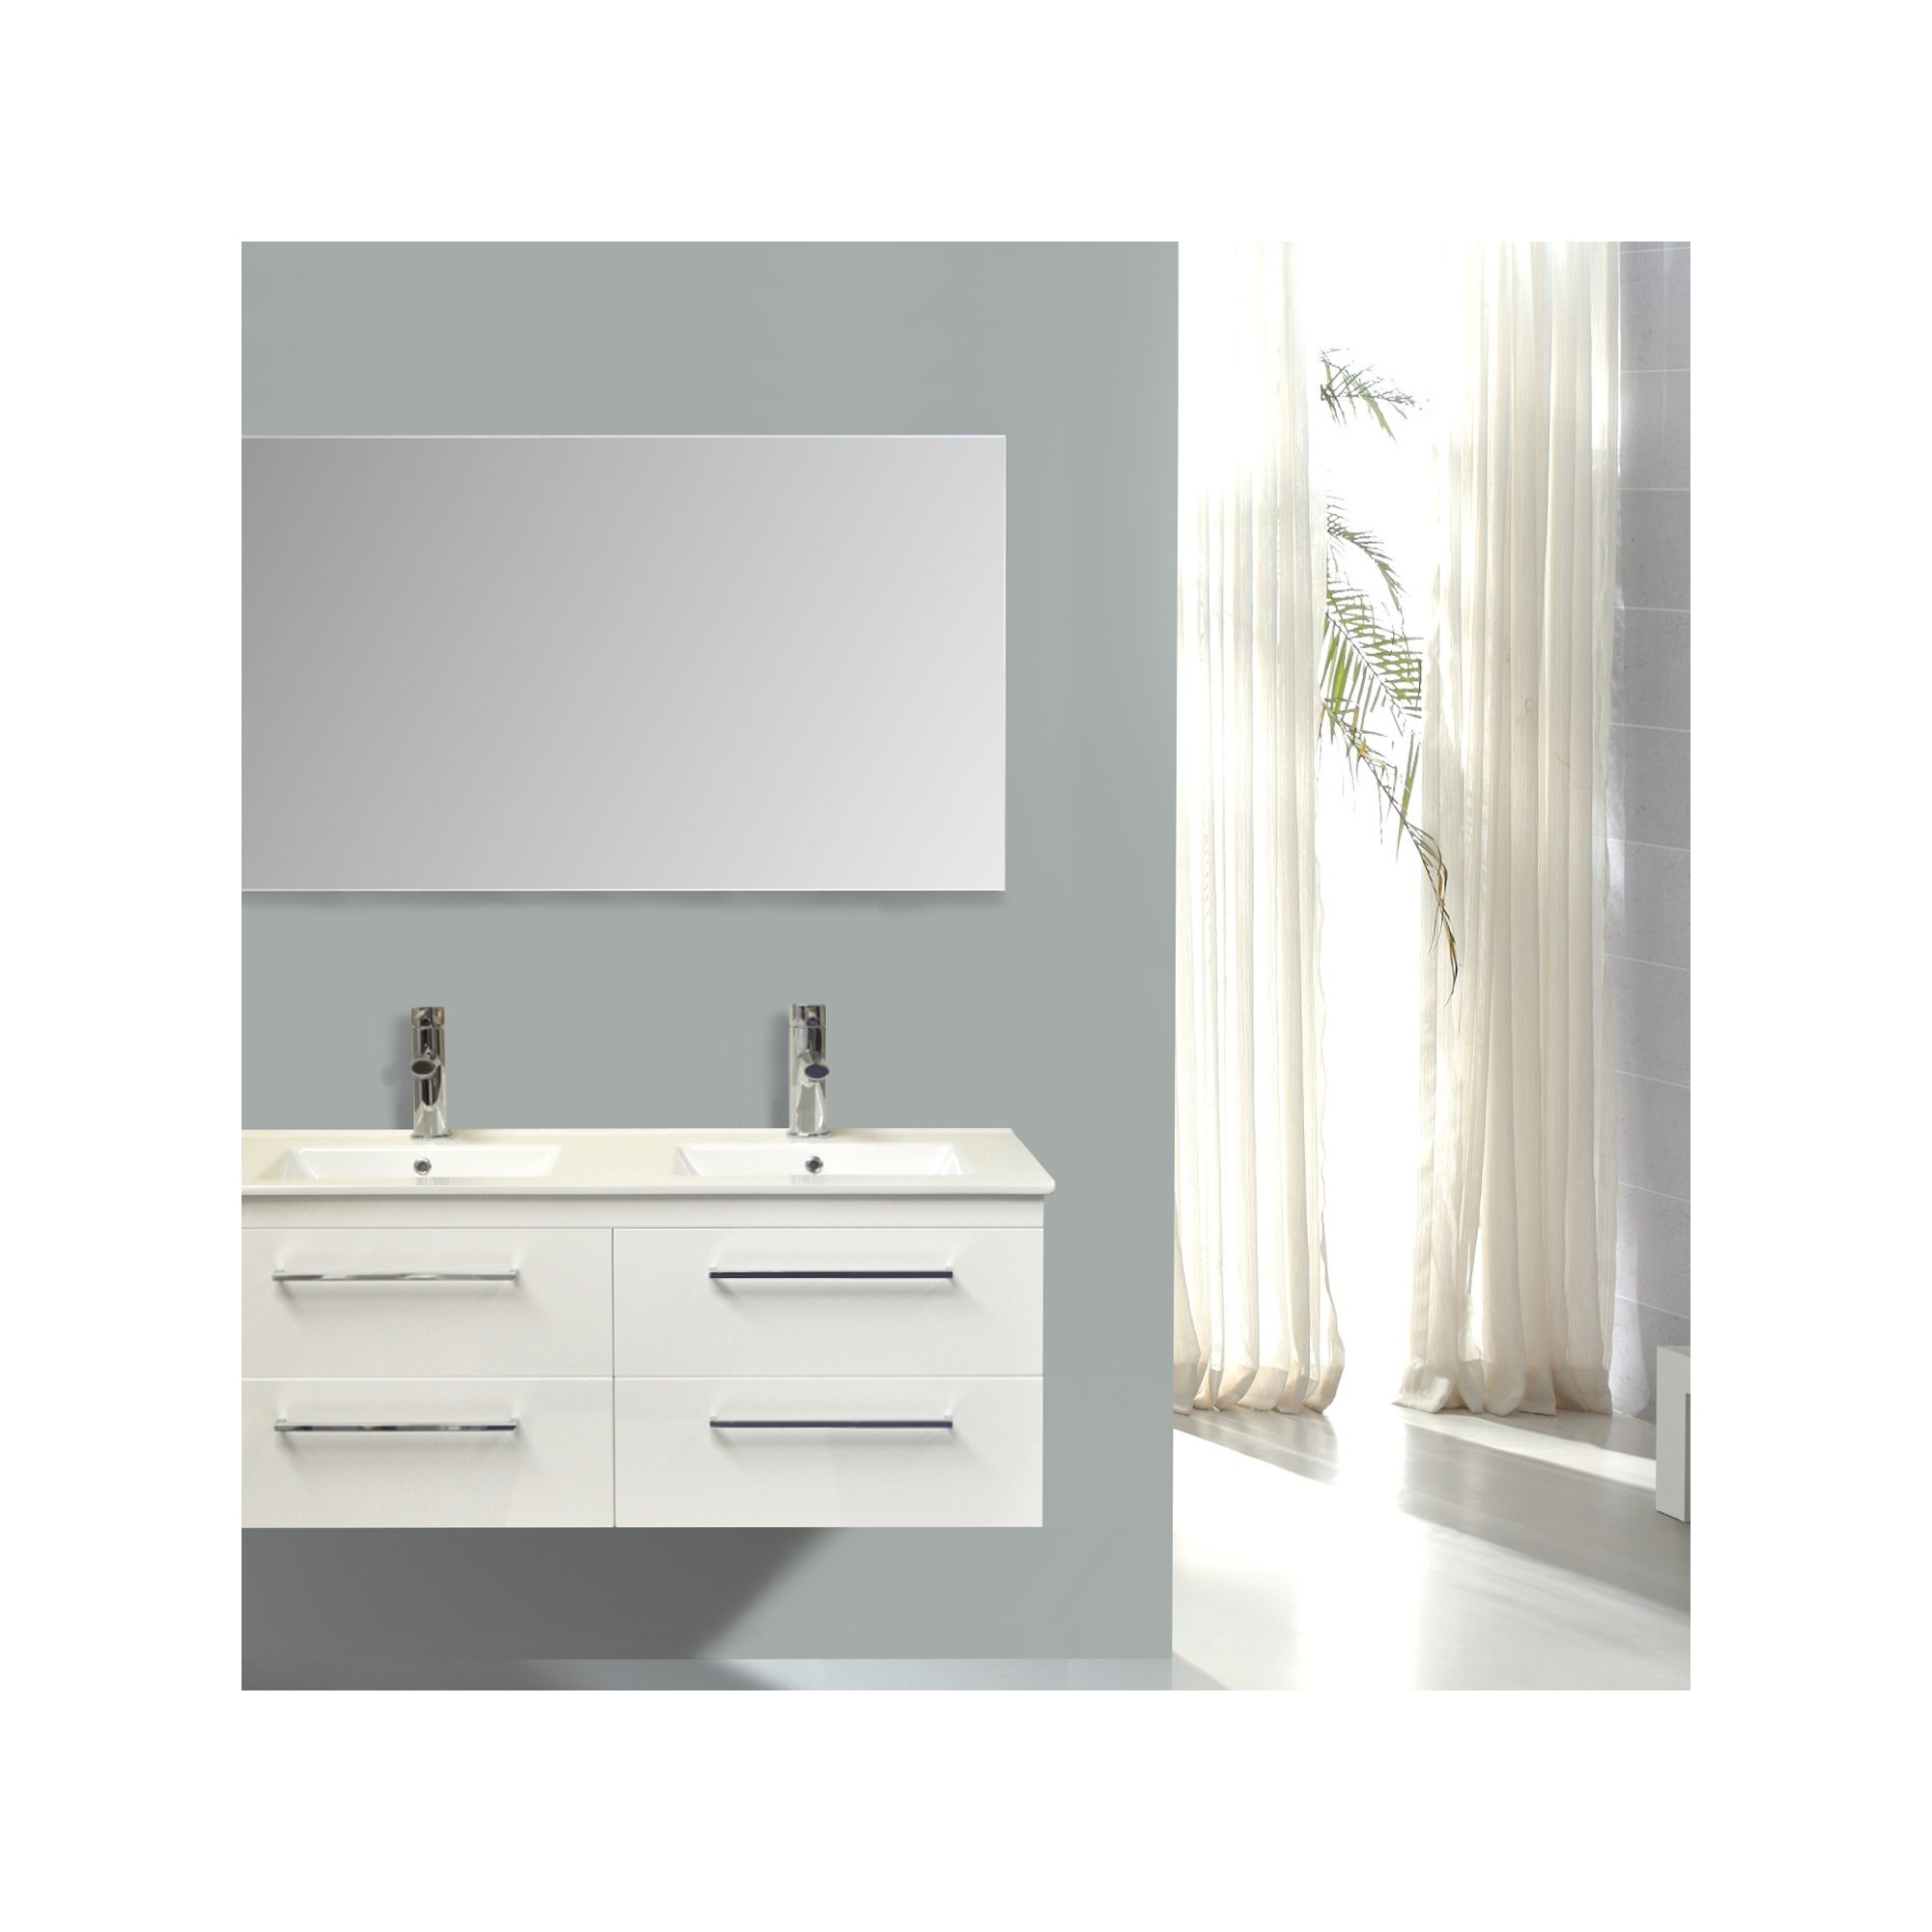 Badkamermeubelset Sanicare Q14 4 Laden Hoogglans Wit (spiegel optioneel)